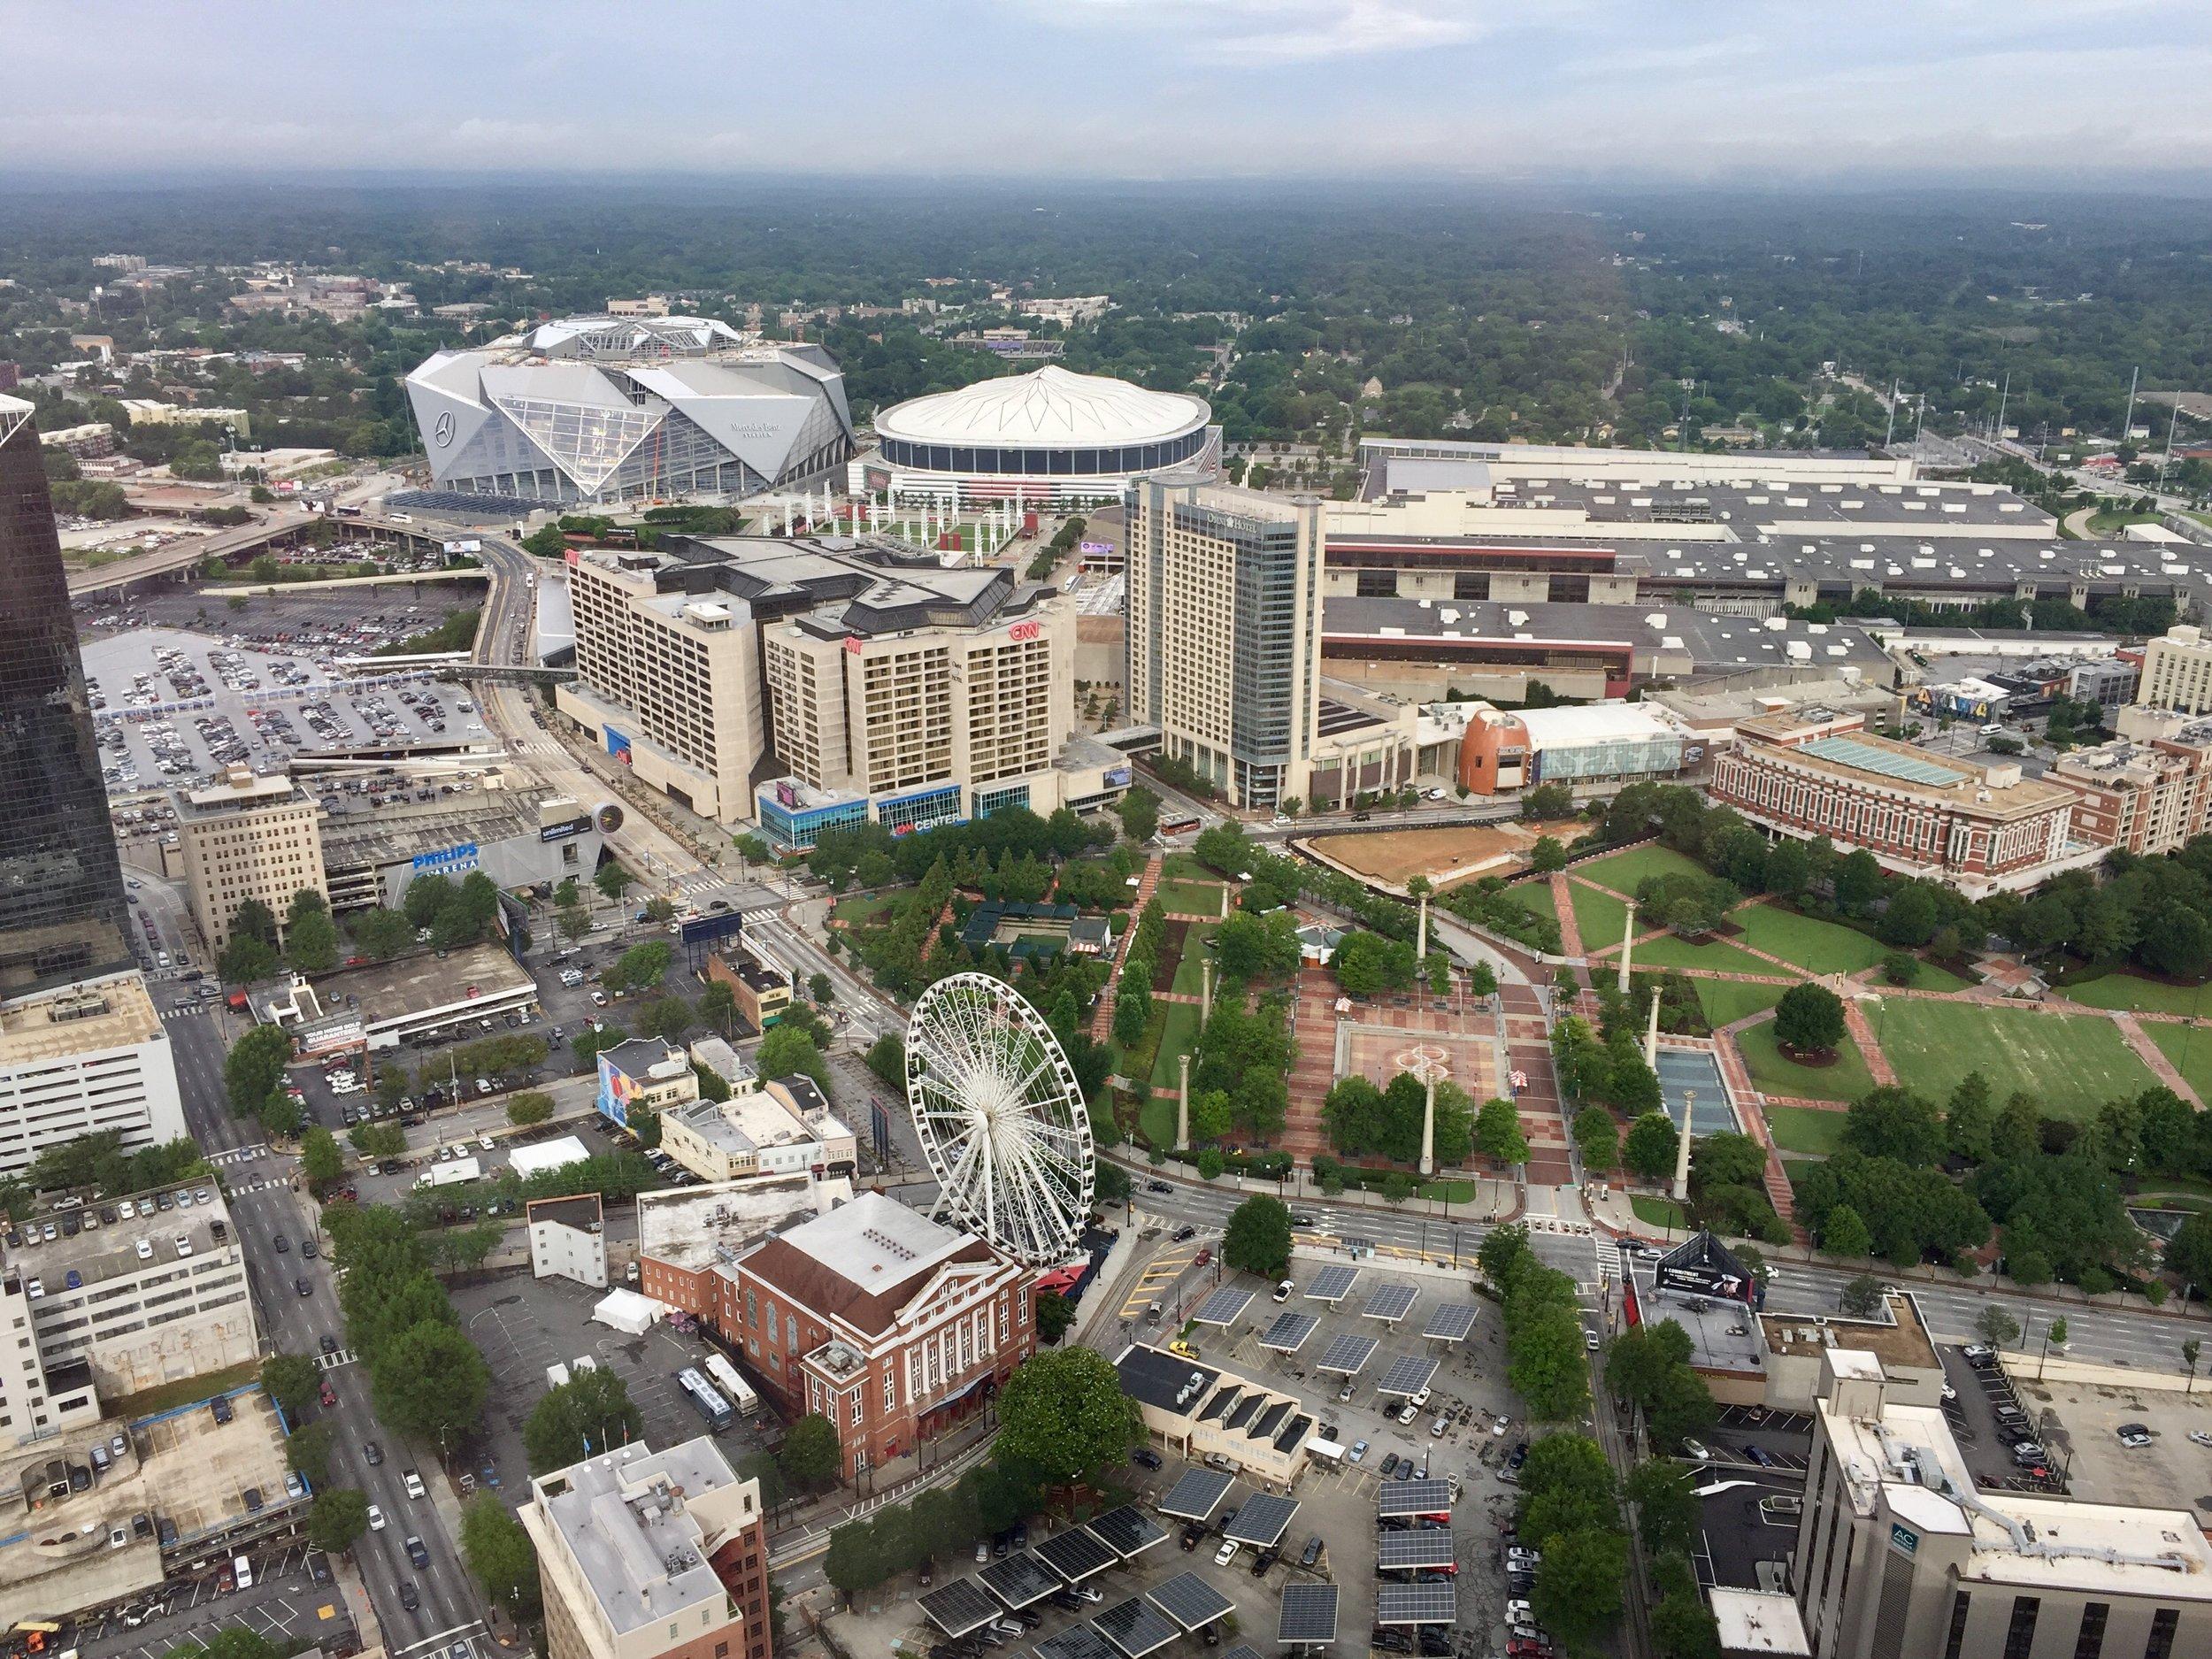 Bird's eye view of Atlanta, including Centennial Olympic Park, the Georgia Dome, the new Mercedes-Benz Stadium, and of course, the Georgia World Congress Center.